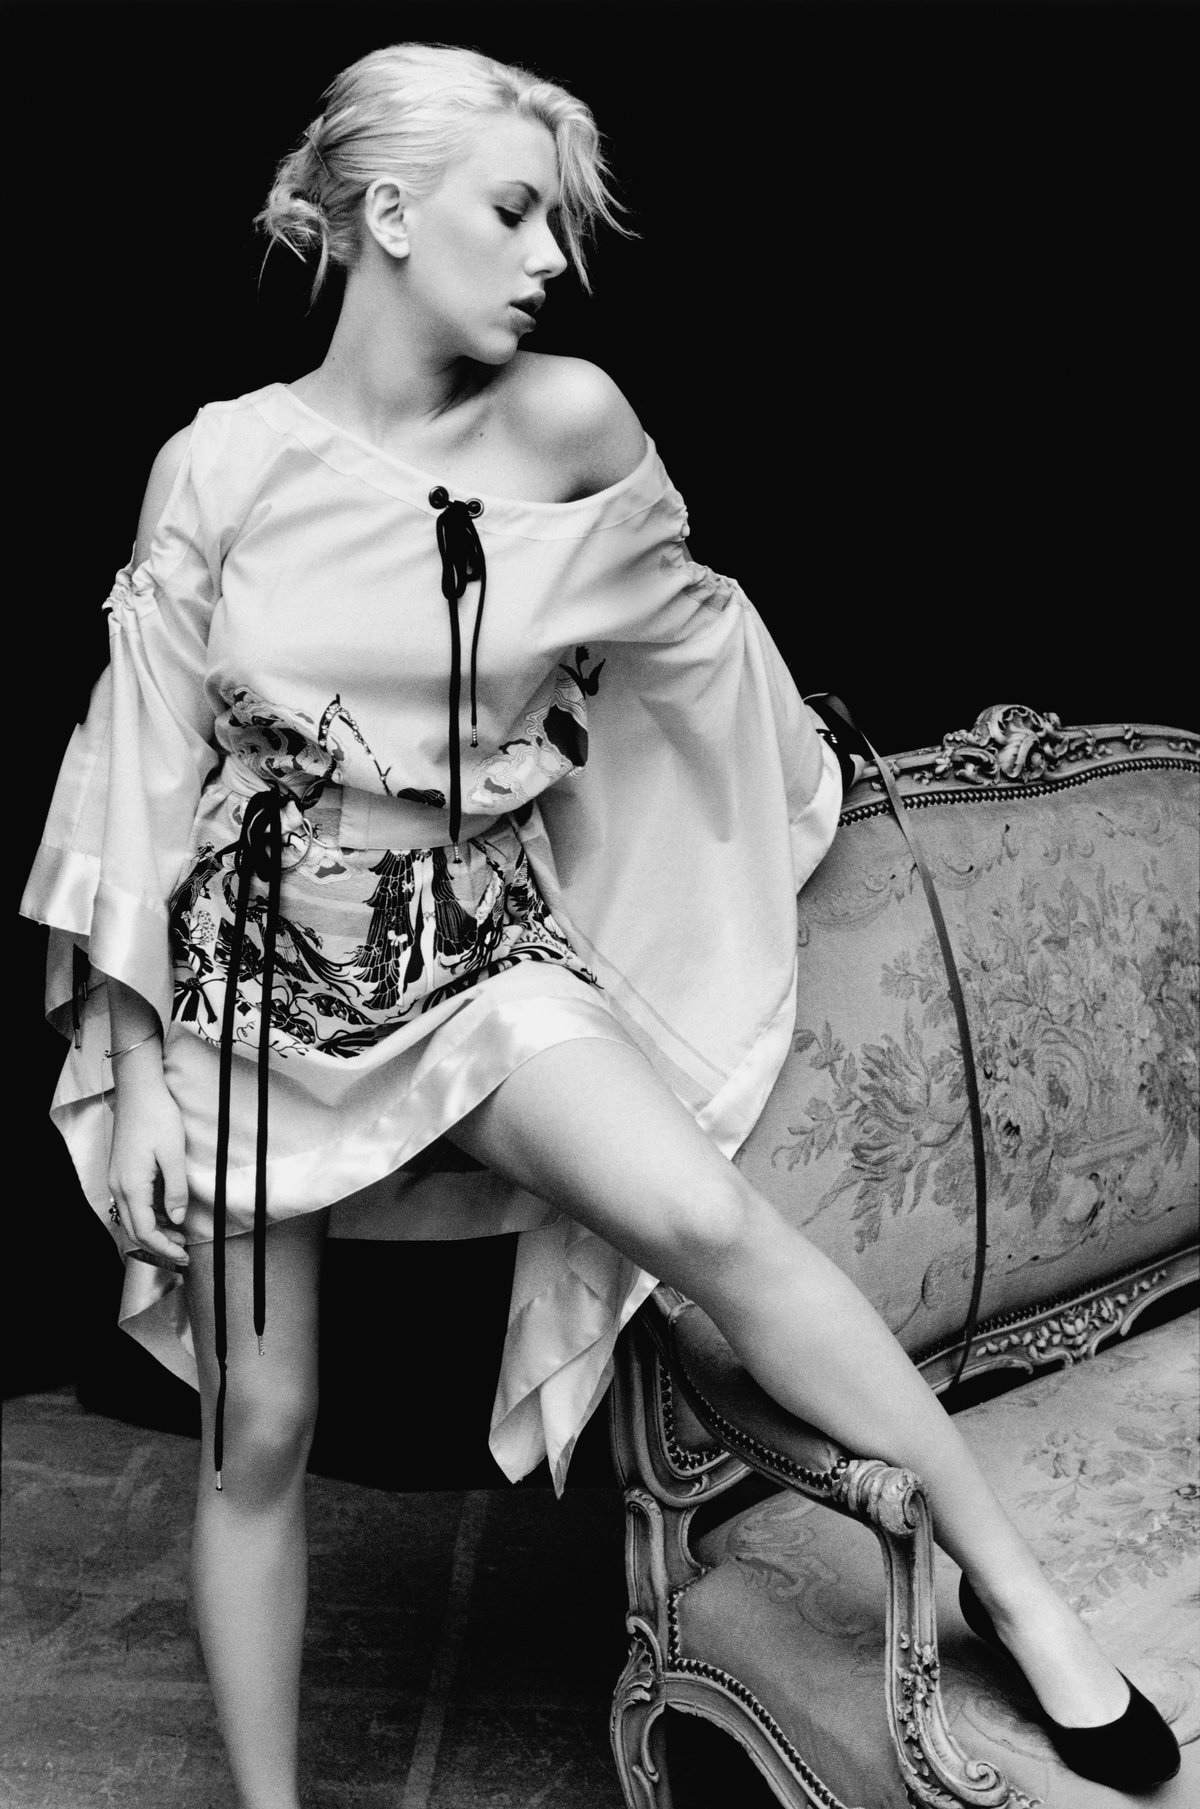 Scarlett johansson yariv milchan 2004 uhq photo shoot